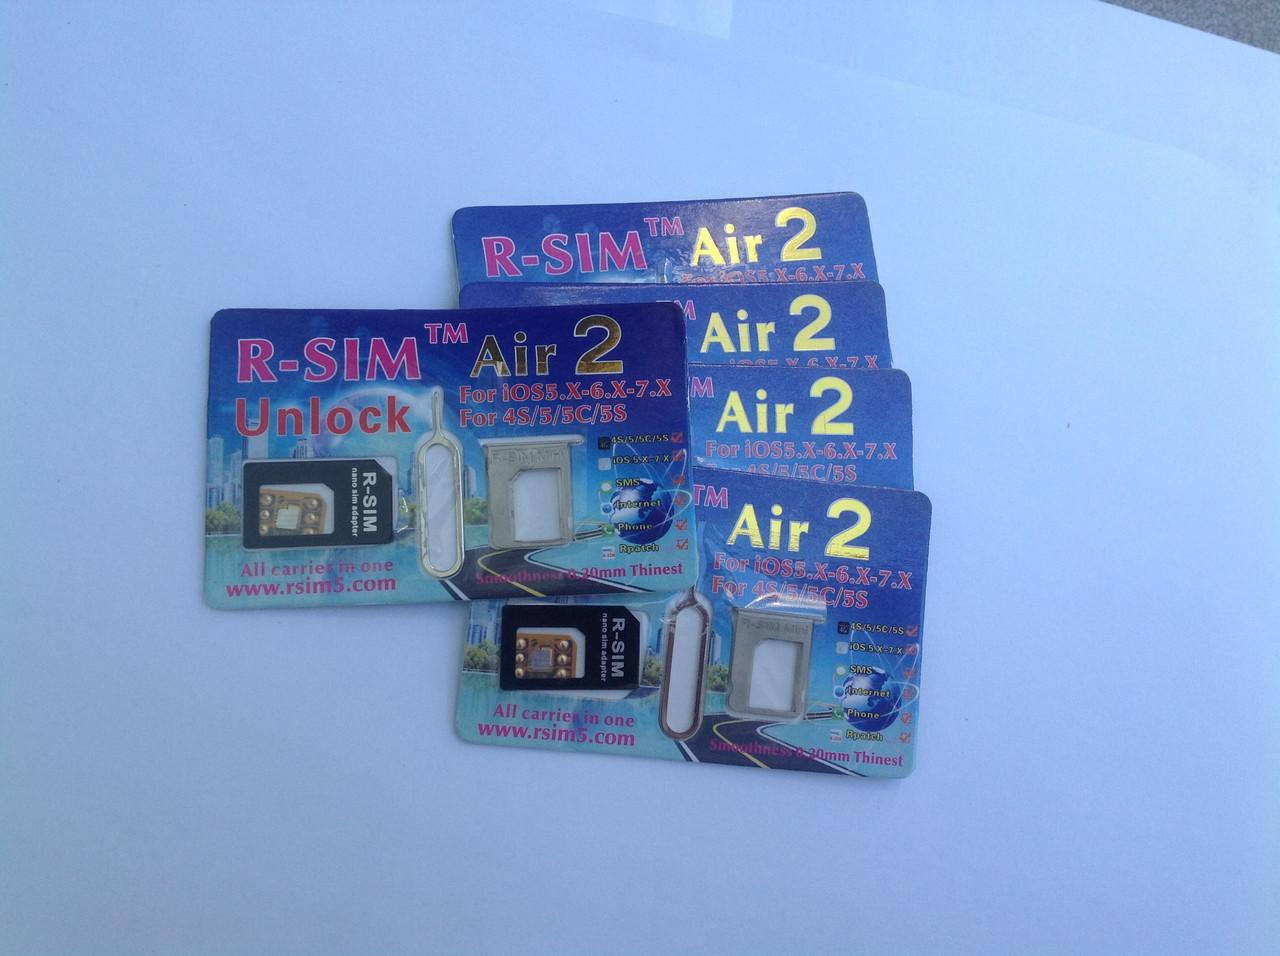 R-Sim Air2 Unlock iPhone 5S, 5C Sprint, T-mobile